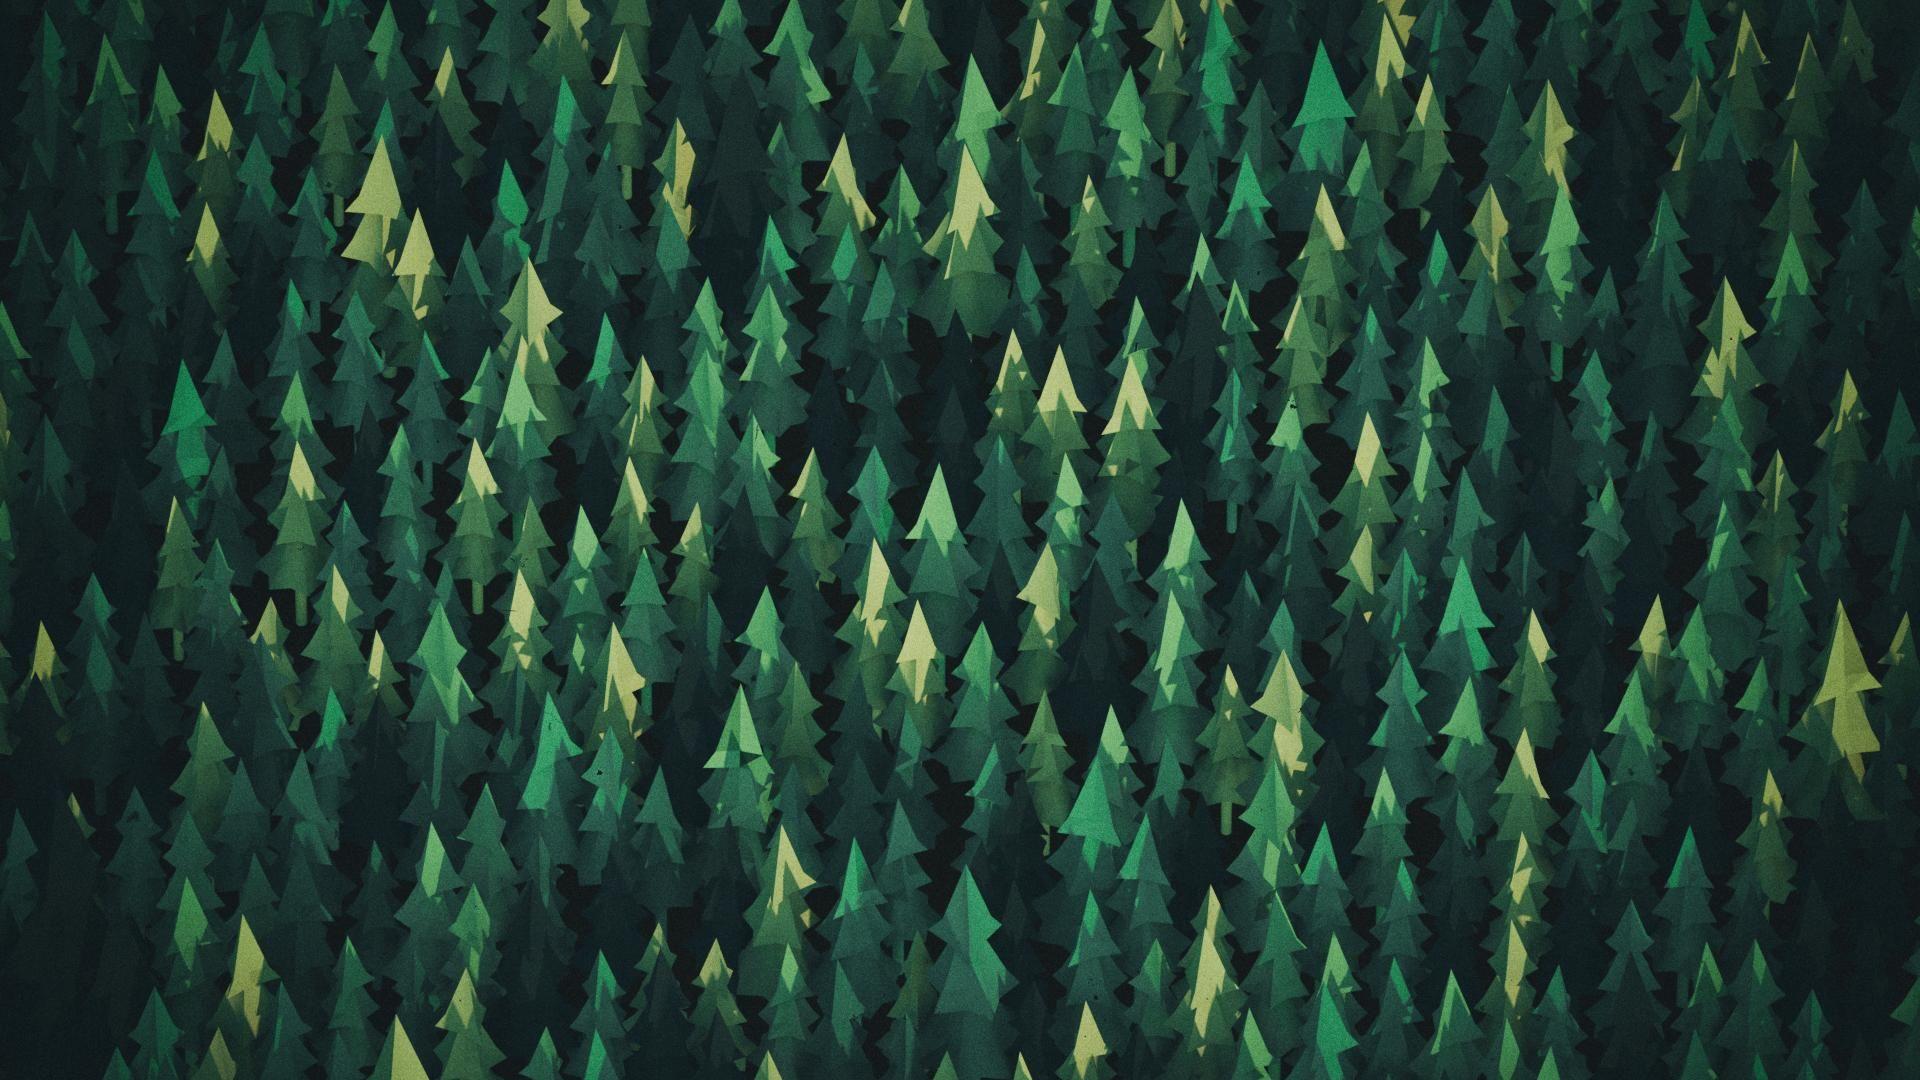 Minimalist Wallpaper 4k 94274 Lesnye Oboi Samurajskoe Iskusstvo Oboi